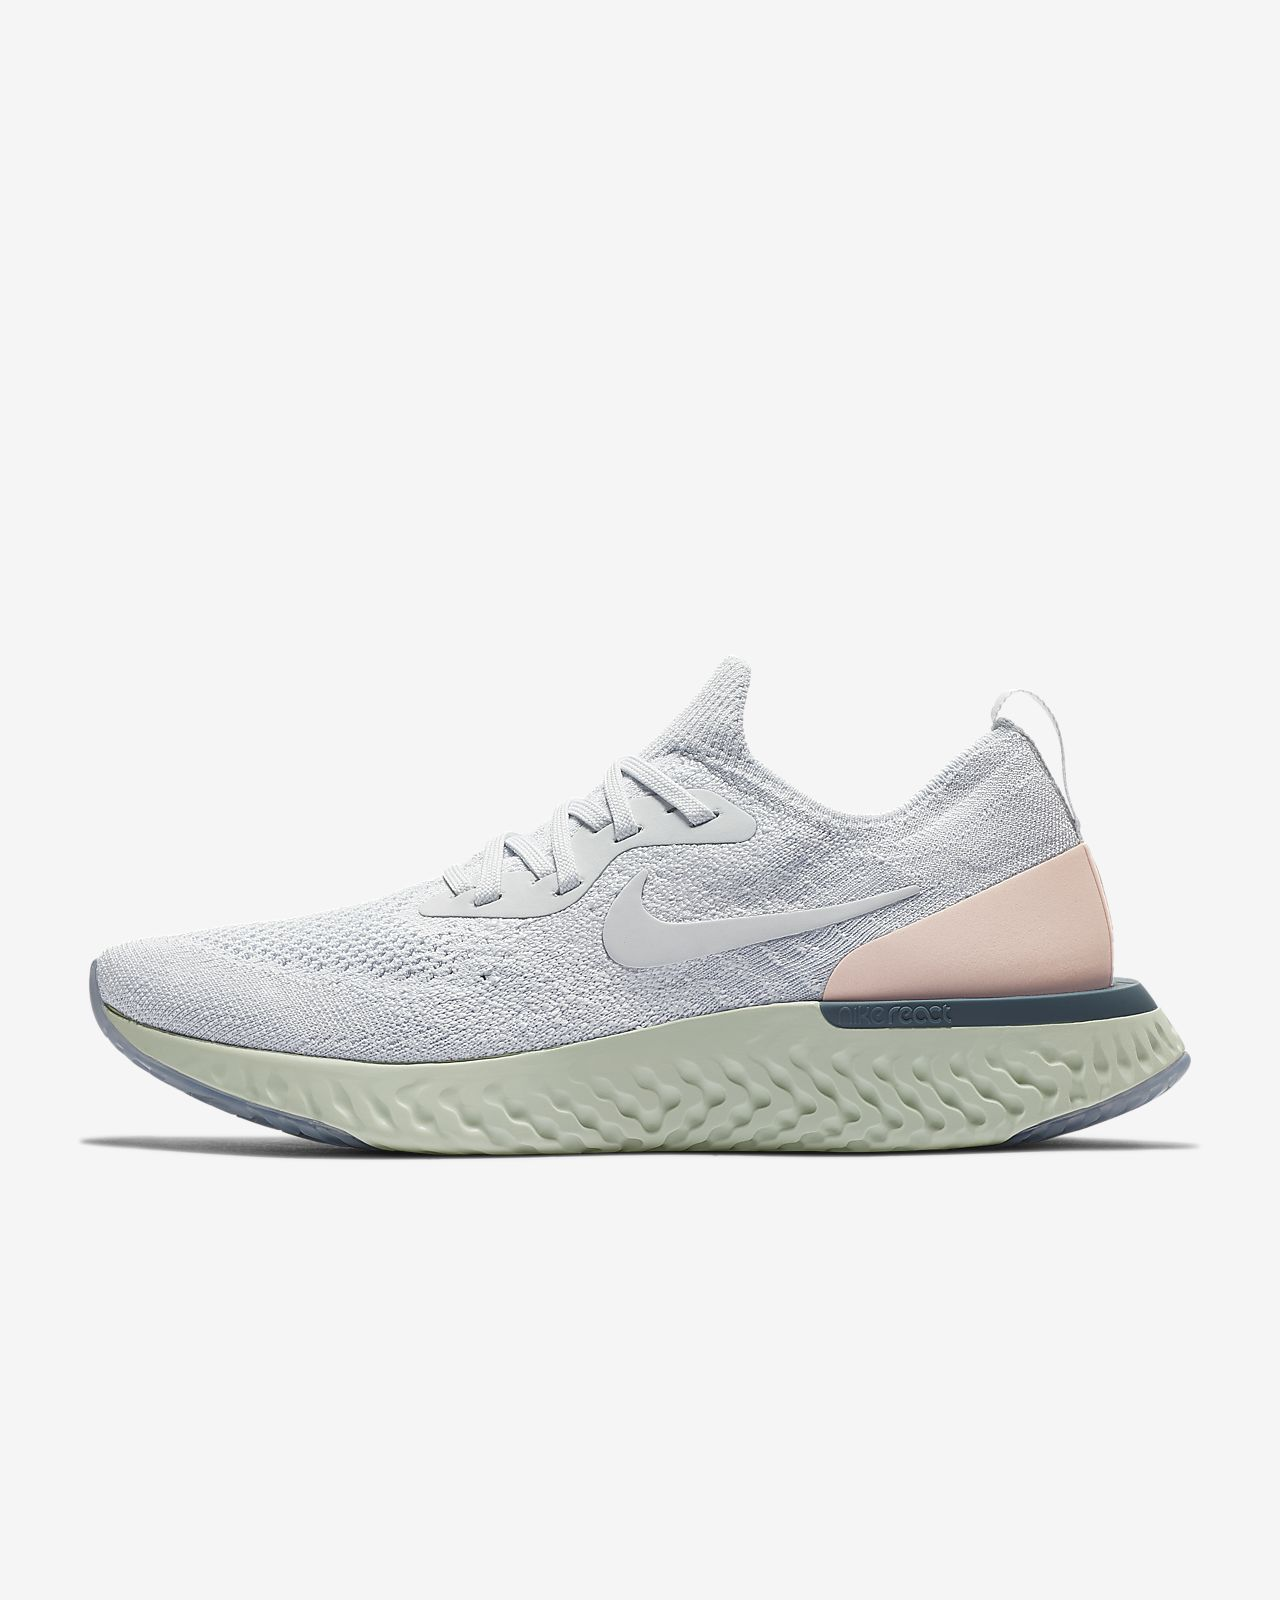 8903055ab7f1 Nike Epic React Flyknit 1 Women s Running Shoe. Nike.com PT